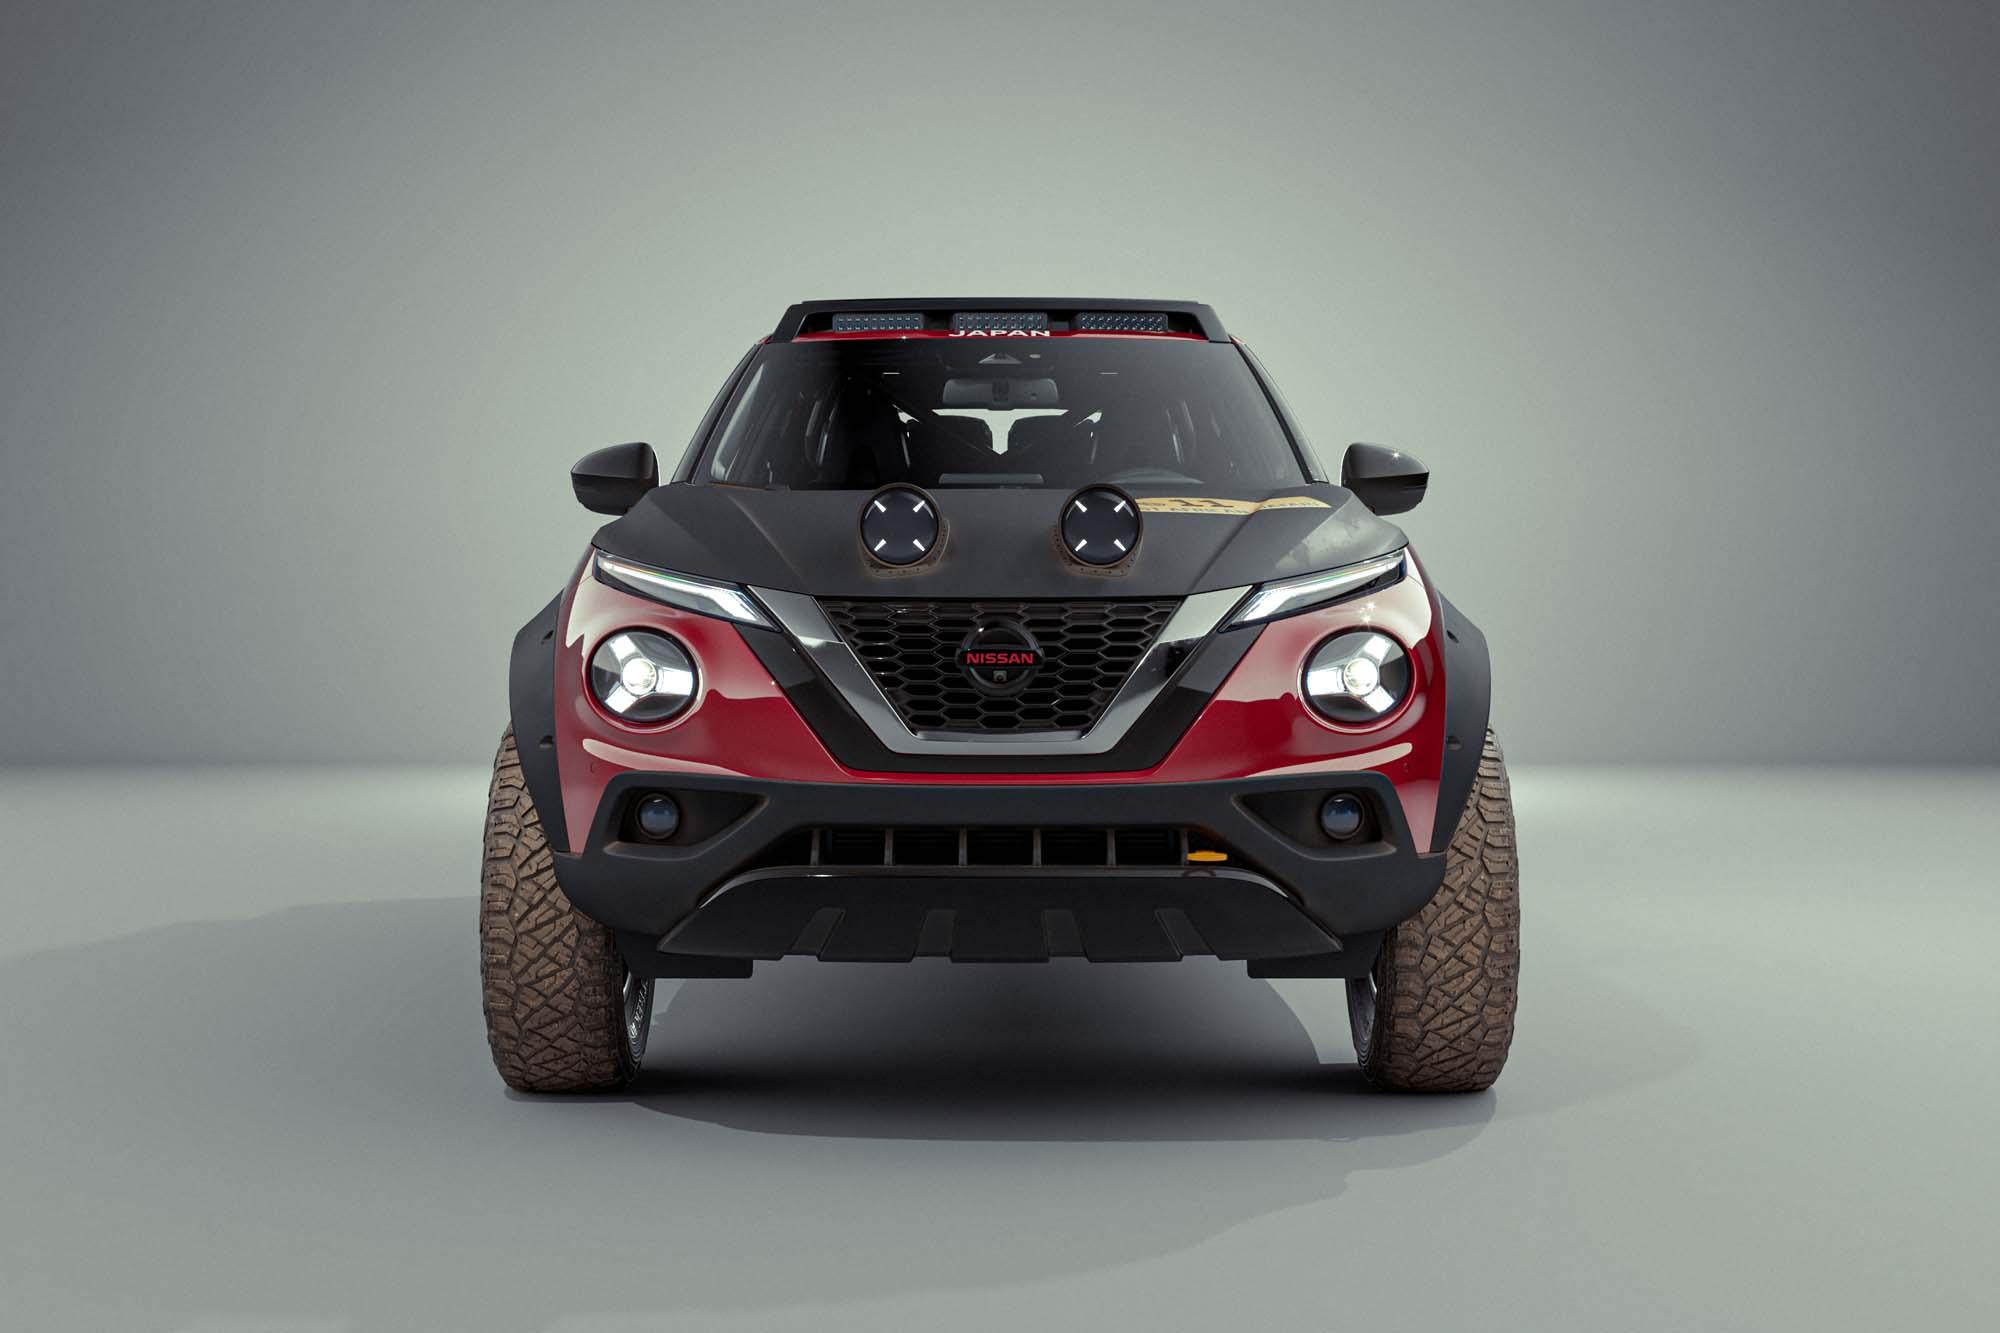 JUKE Rally Heritage Concept 4.JPG Πώς σου φαίνεται αυτό το Nissan Juke Rally; Nissan, Nissan Juke, zblog, ειδήσεις, Νέα